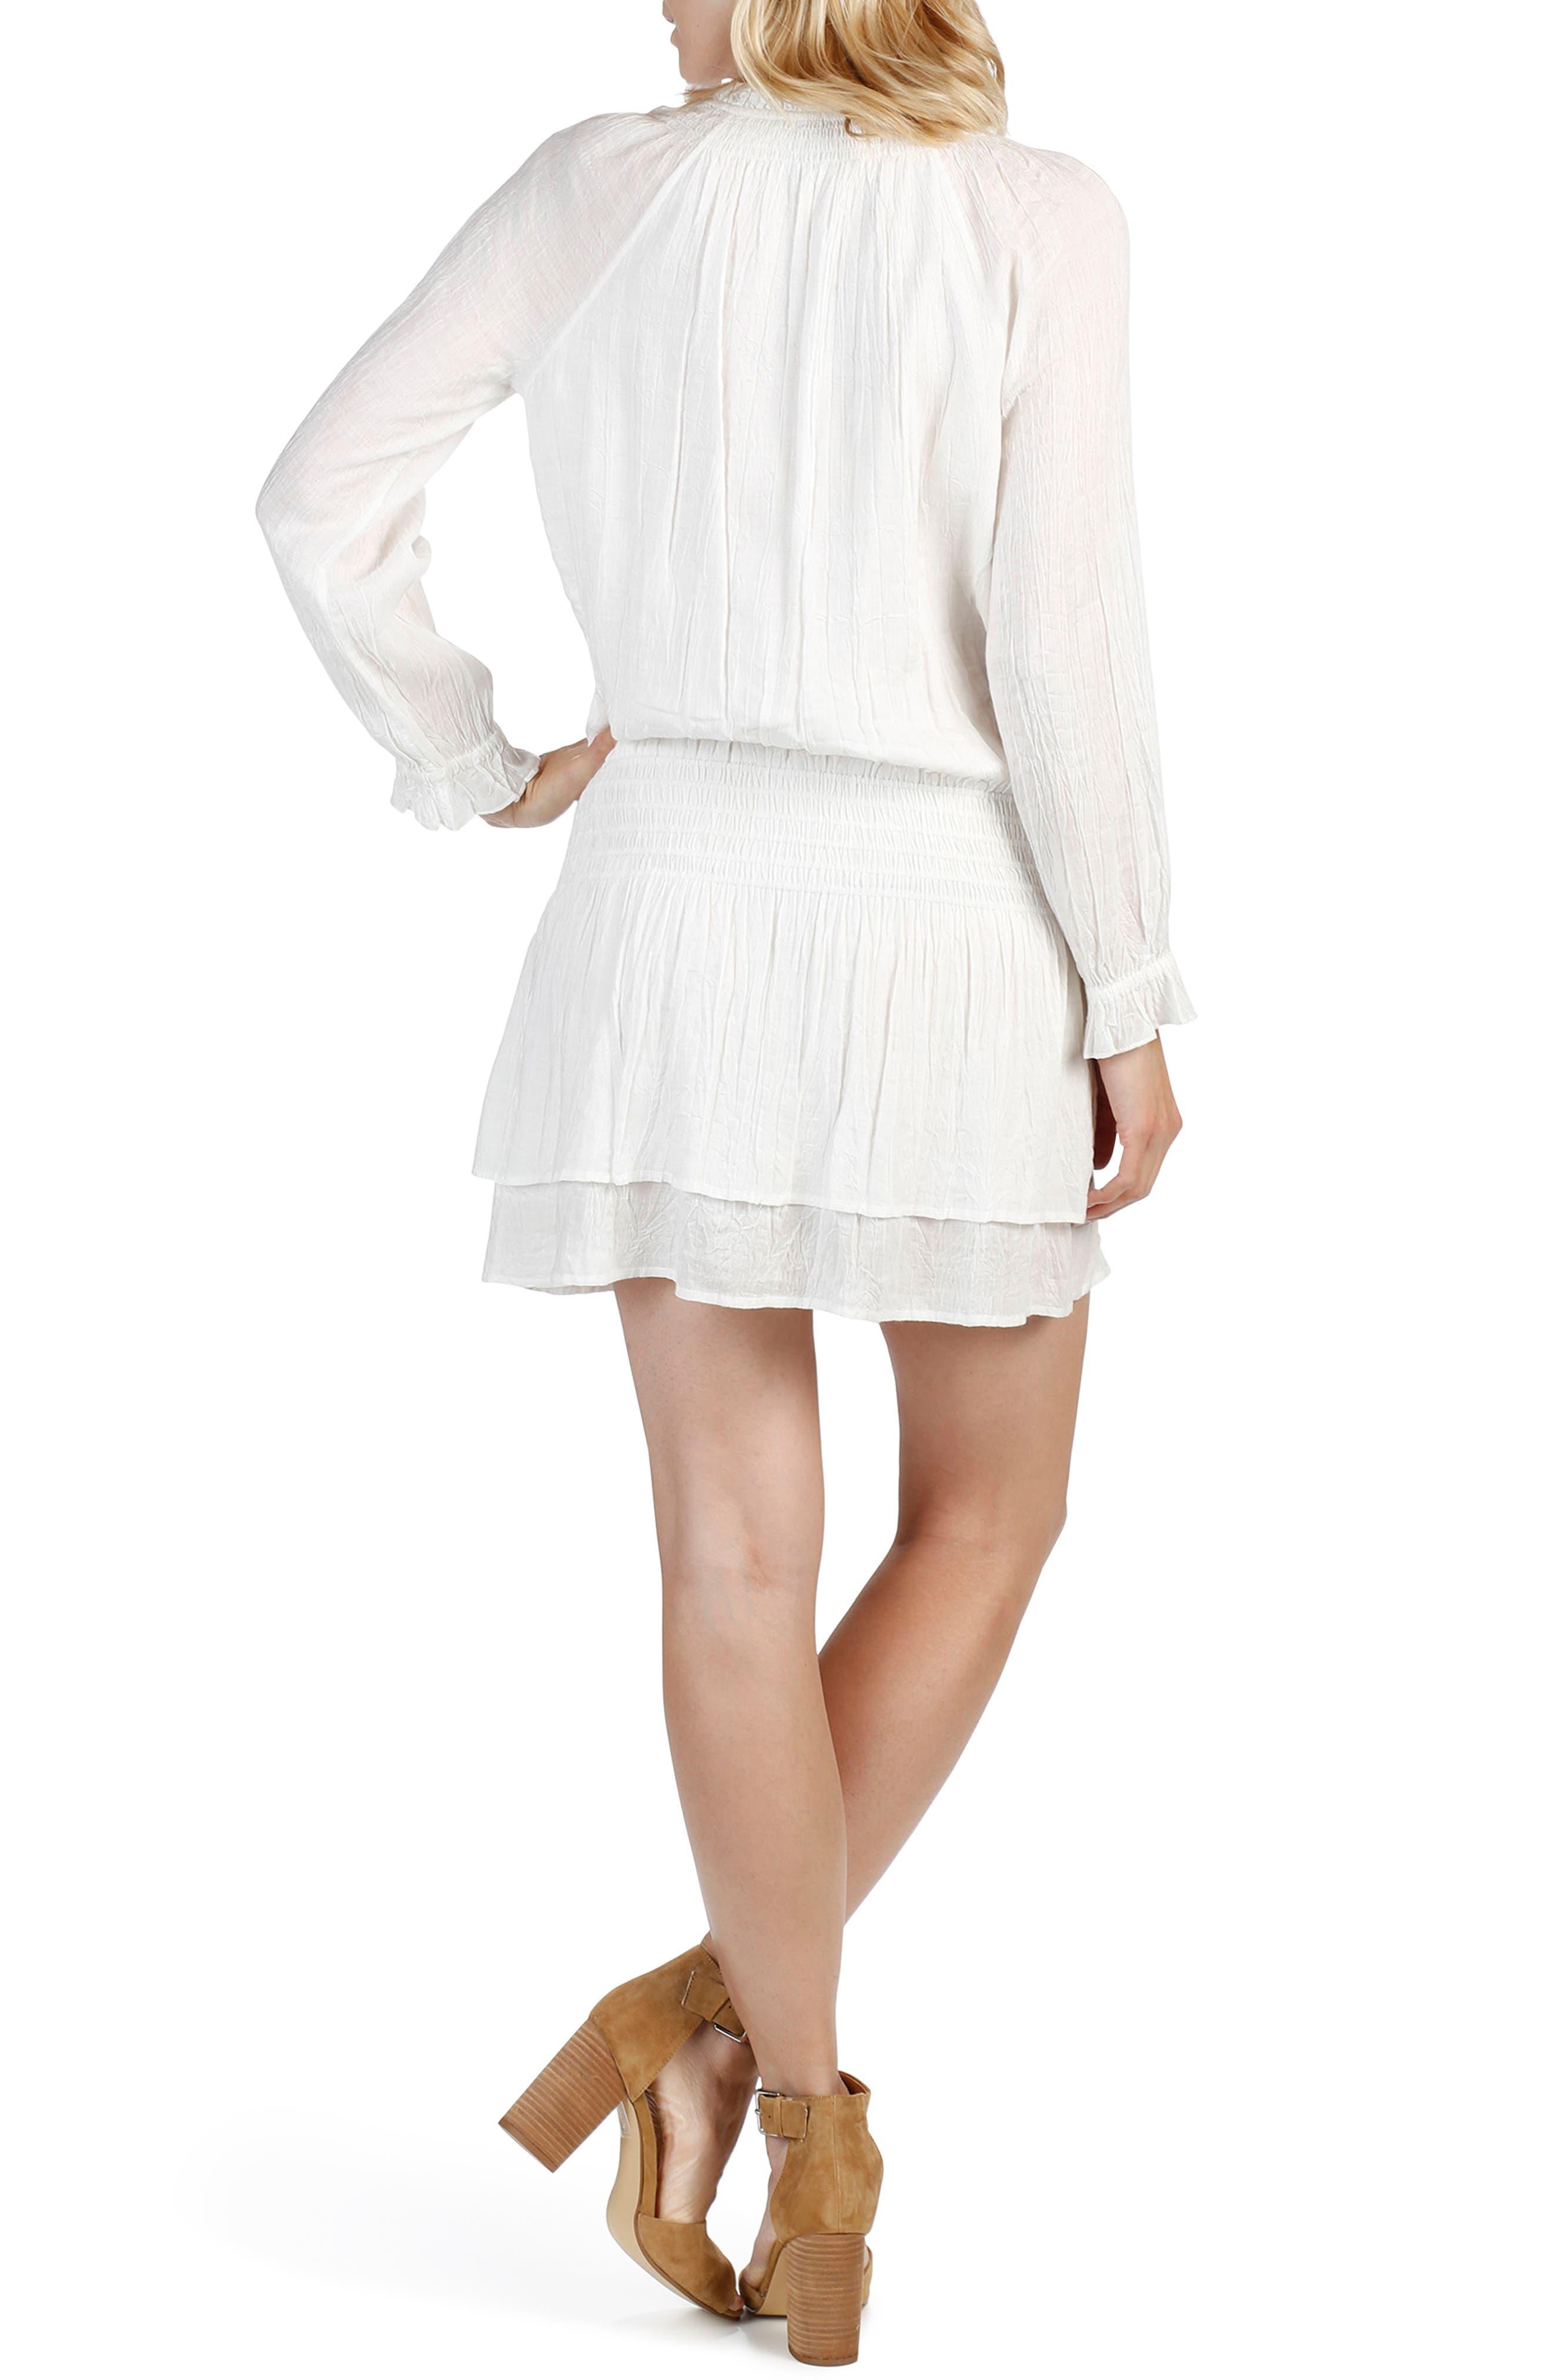 Lemay Dress,                             Alternate thumbnail 2, color,